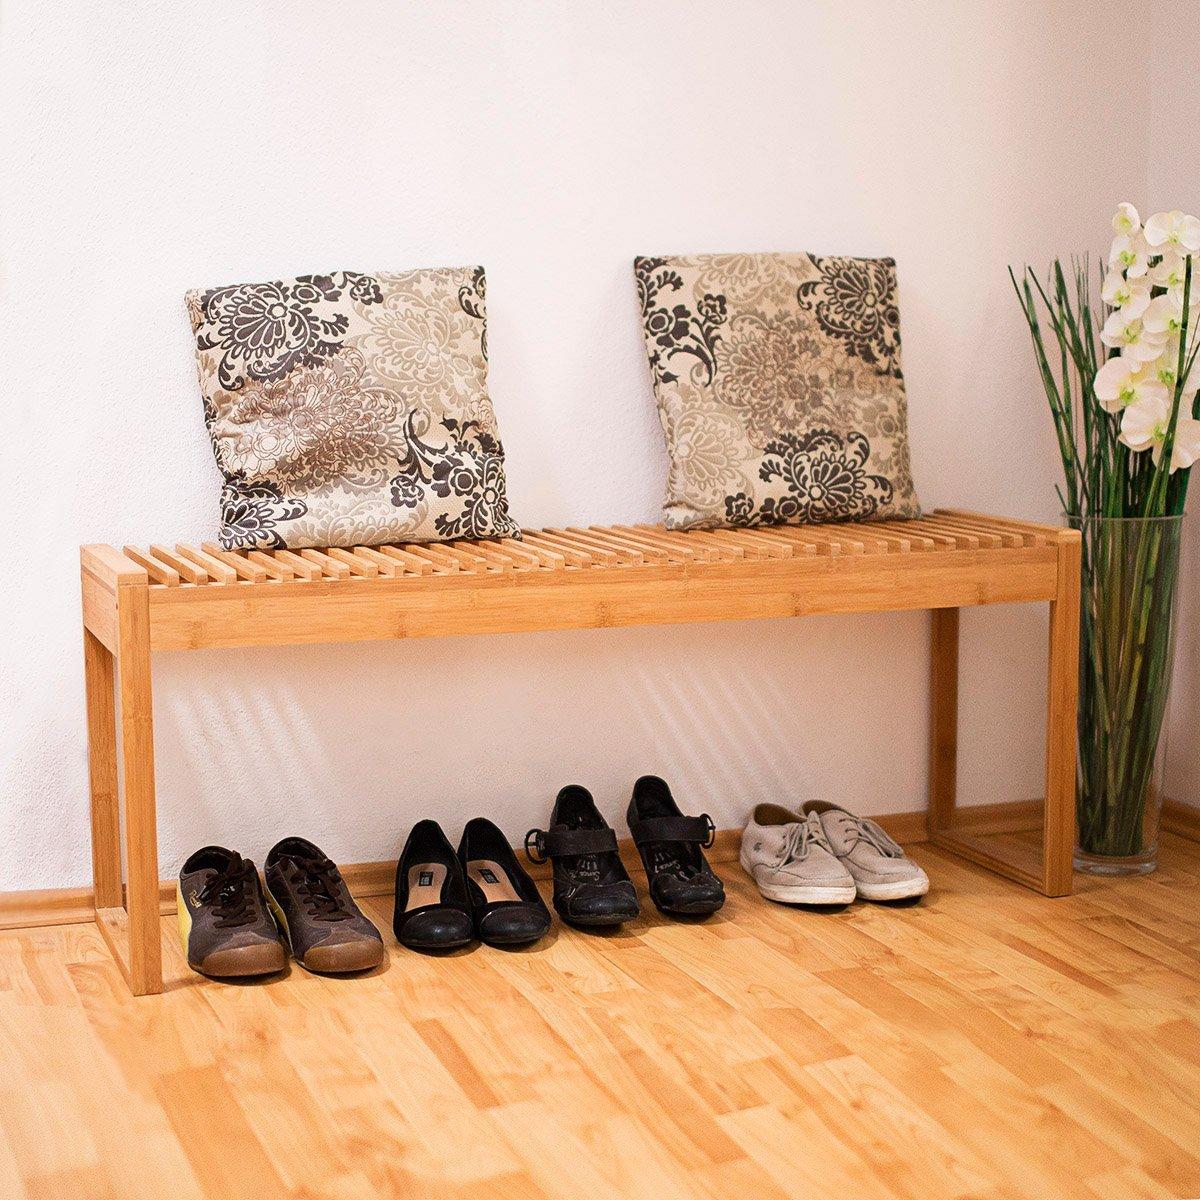 gartenbank ohne lehne 41 meine. Black Bedroom Furniture Sets. Home Design Ideas